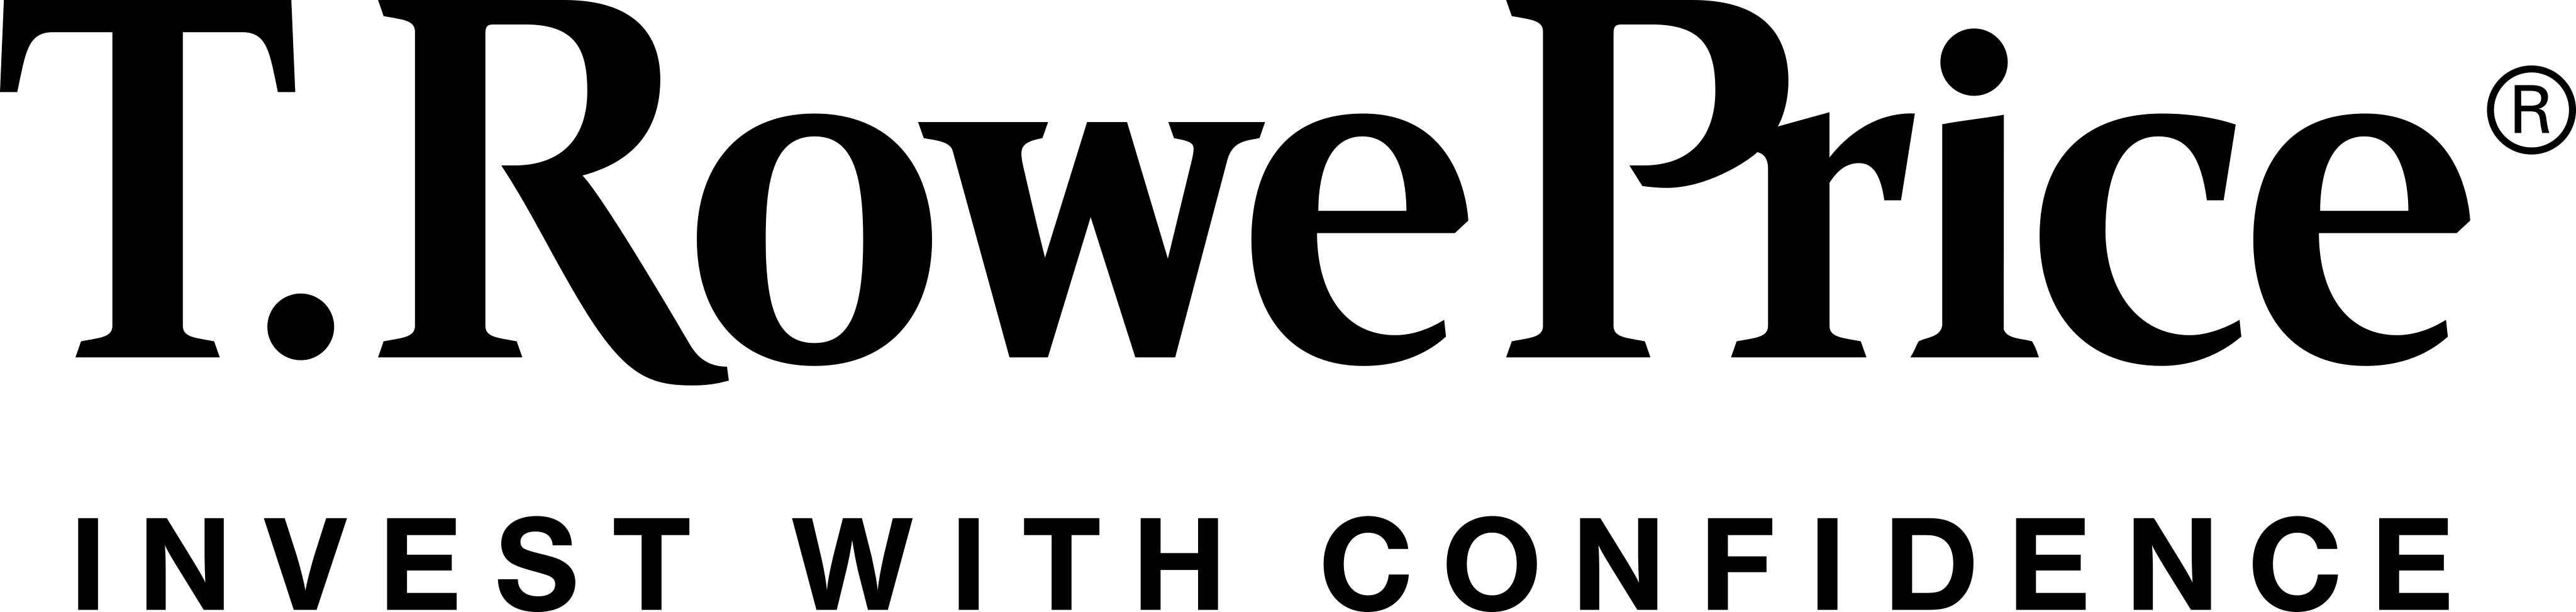 t rowe price logo 1 - T. Rowe Price Logo